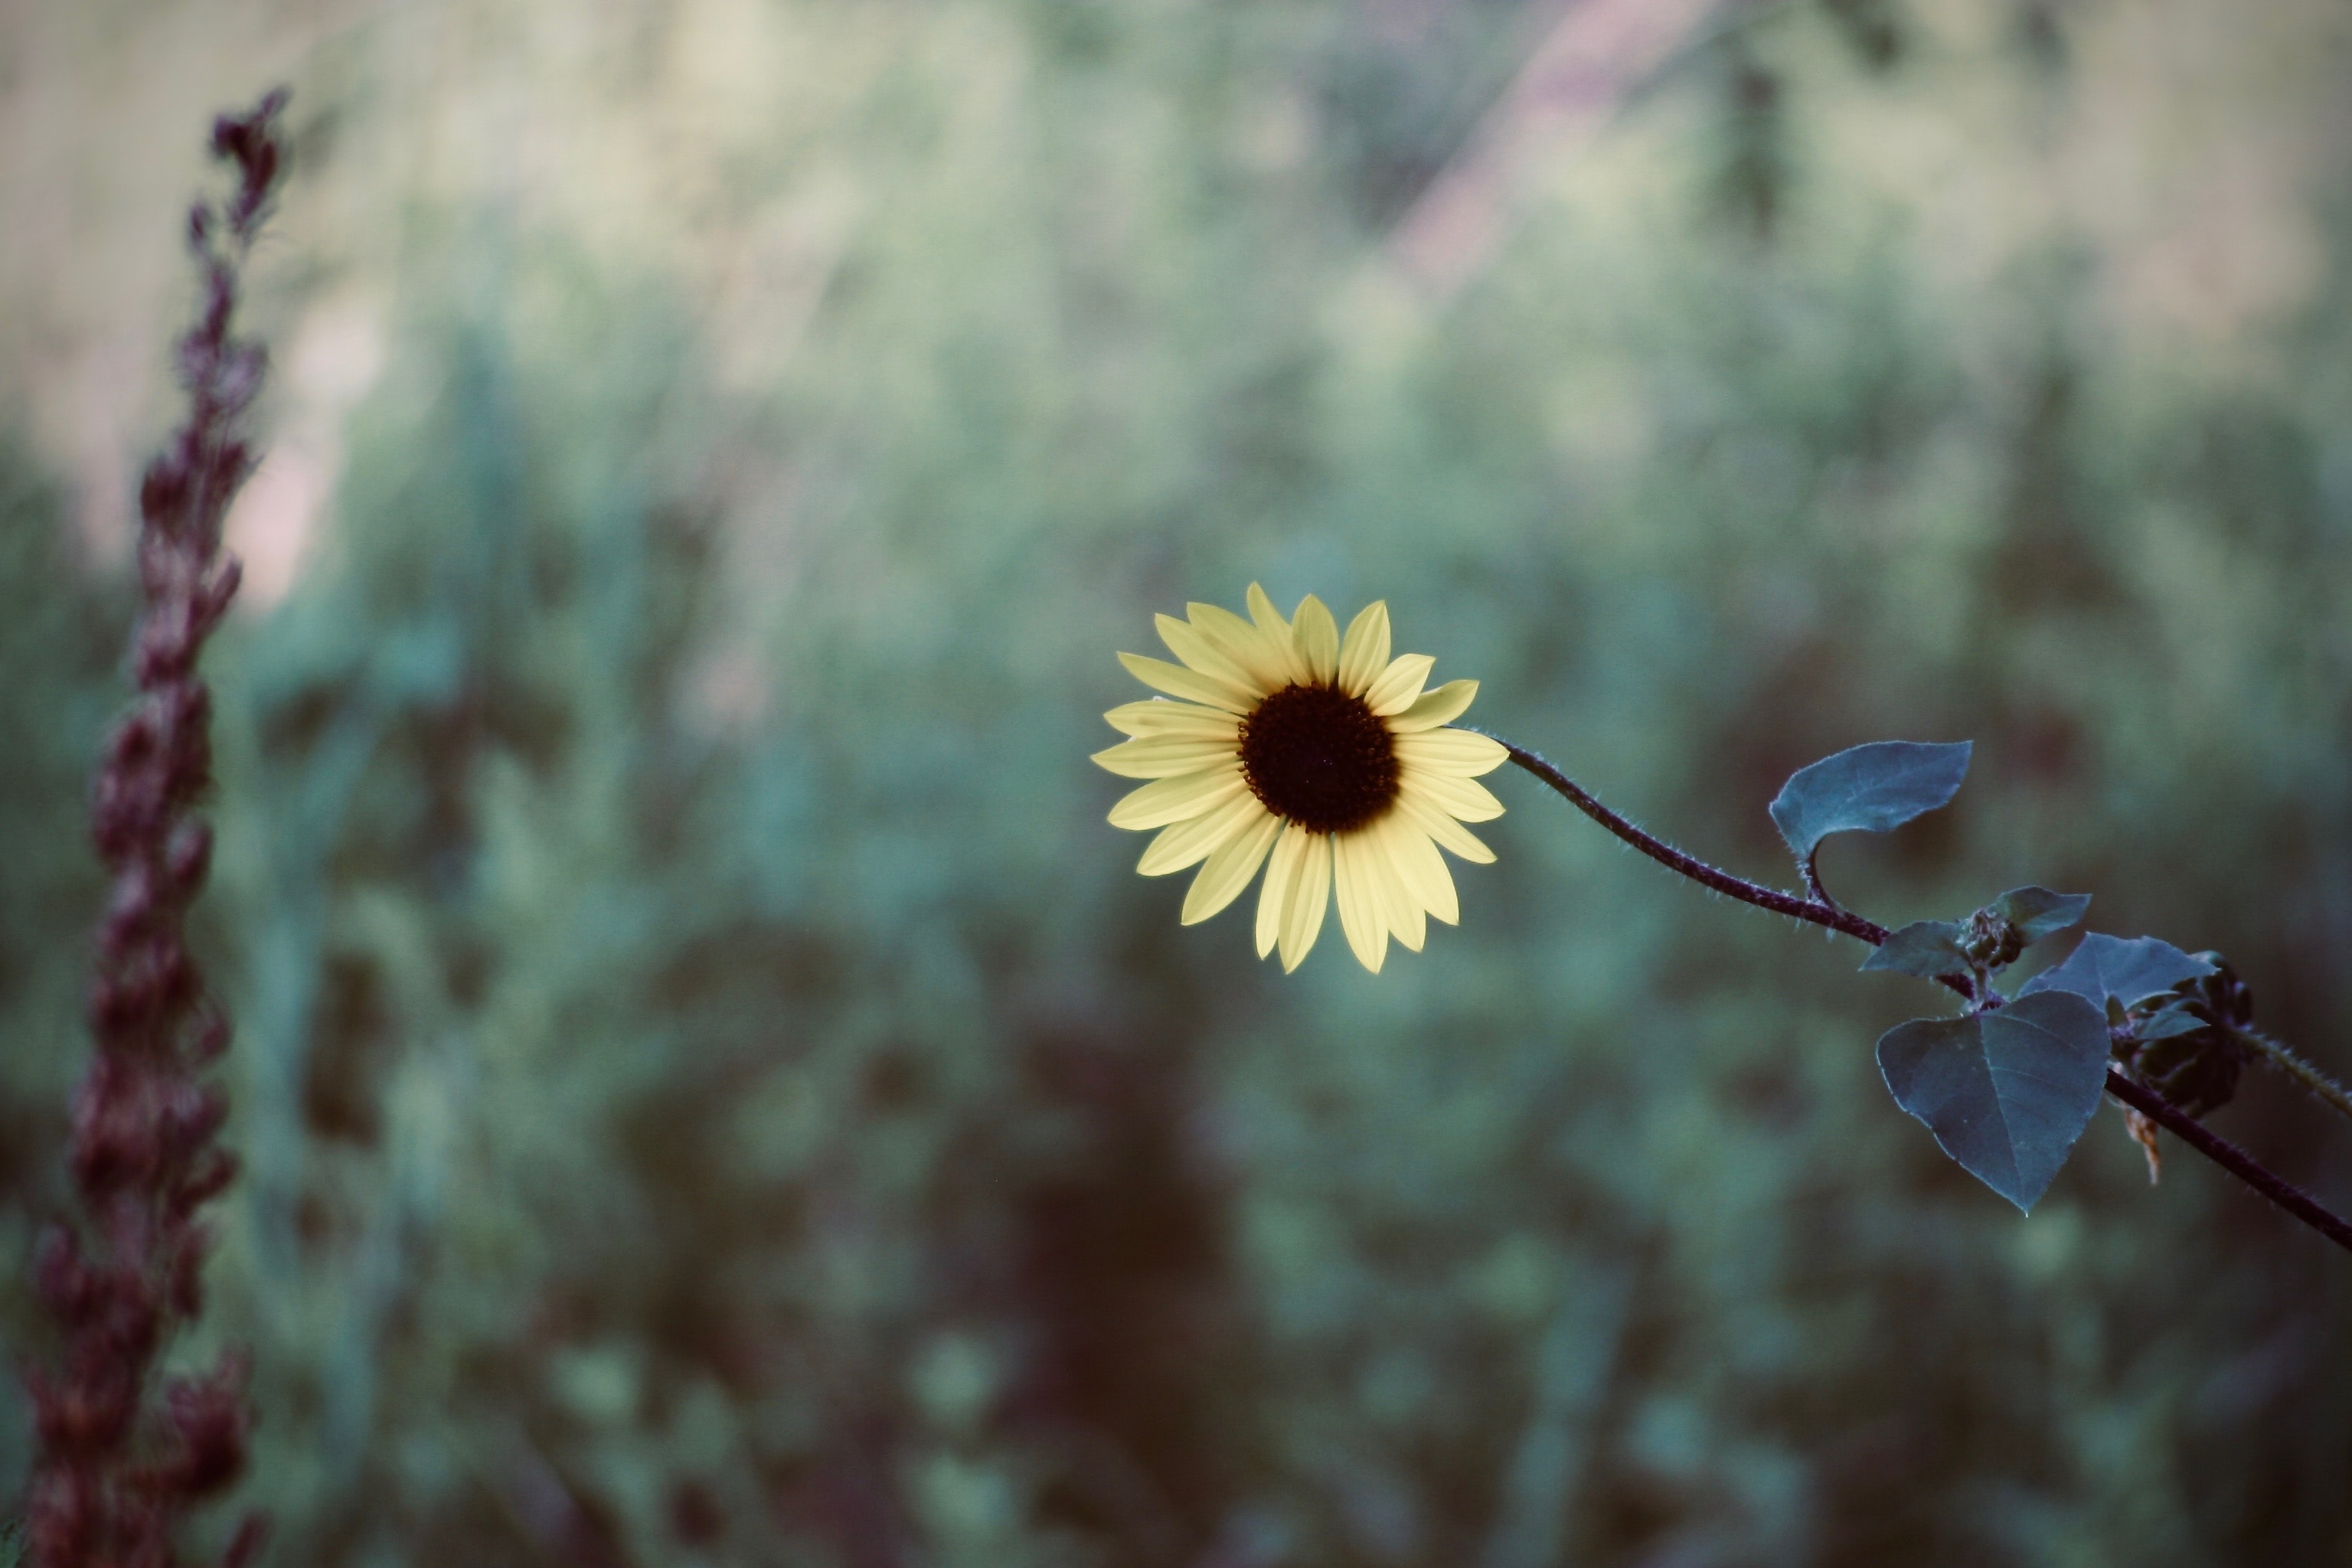 black-eyed Susan flower at bloom